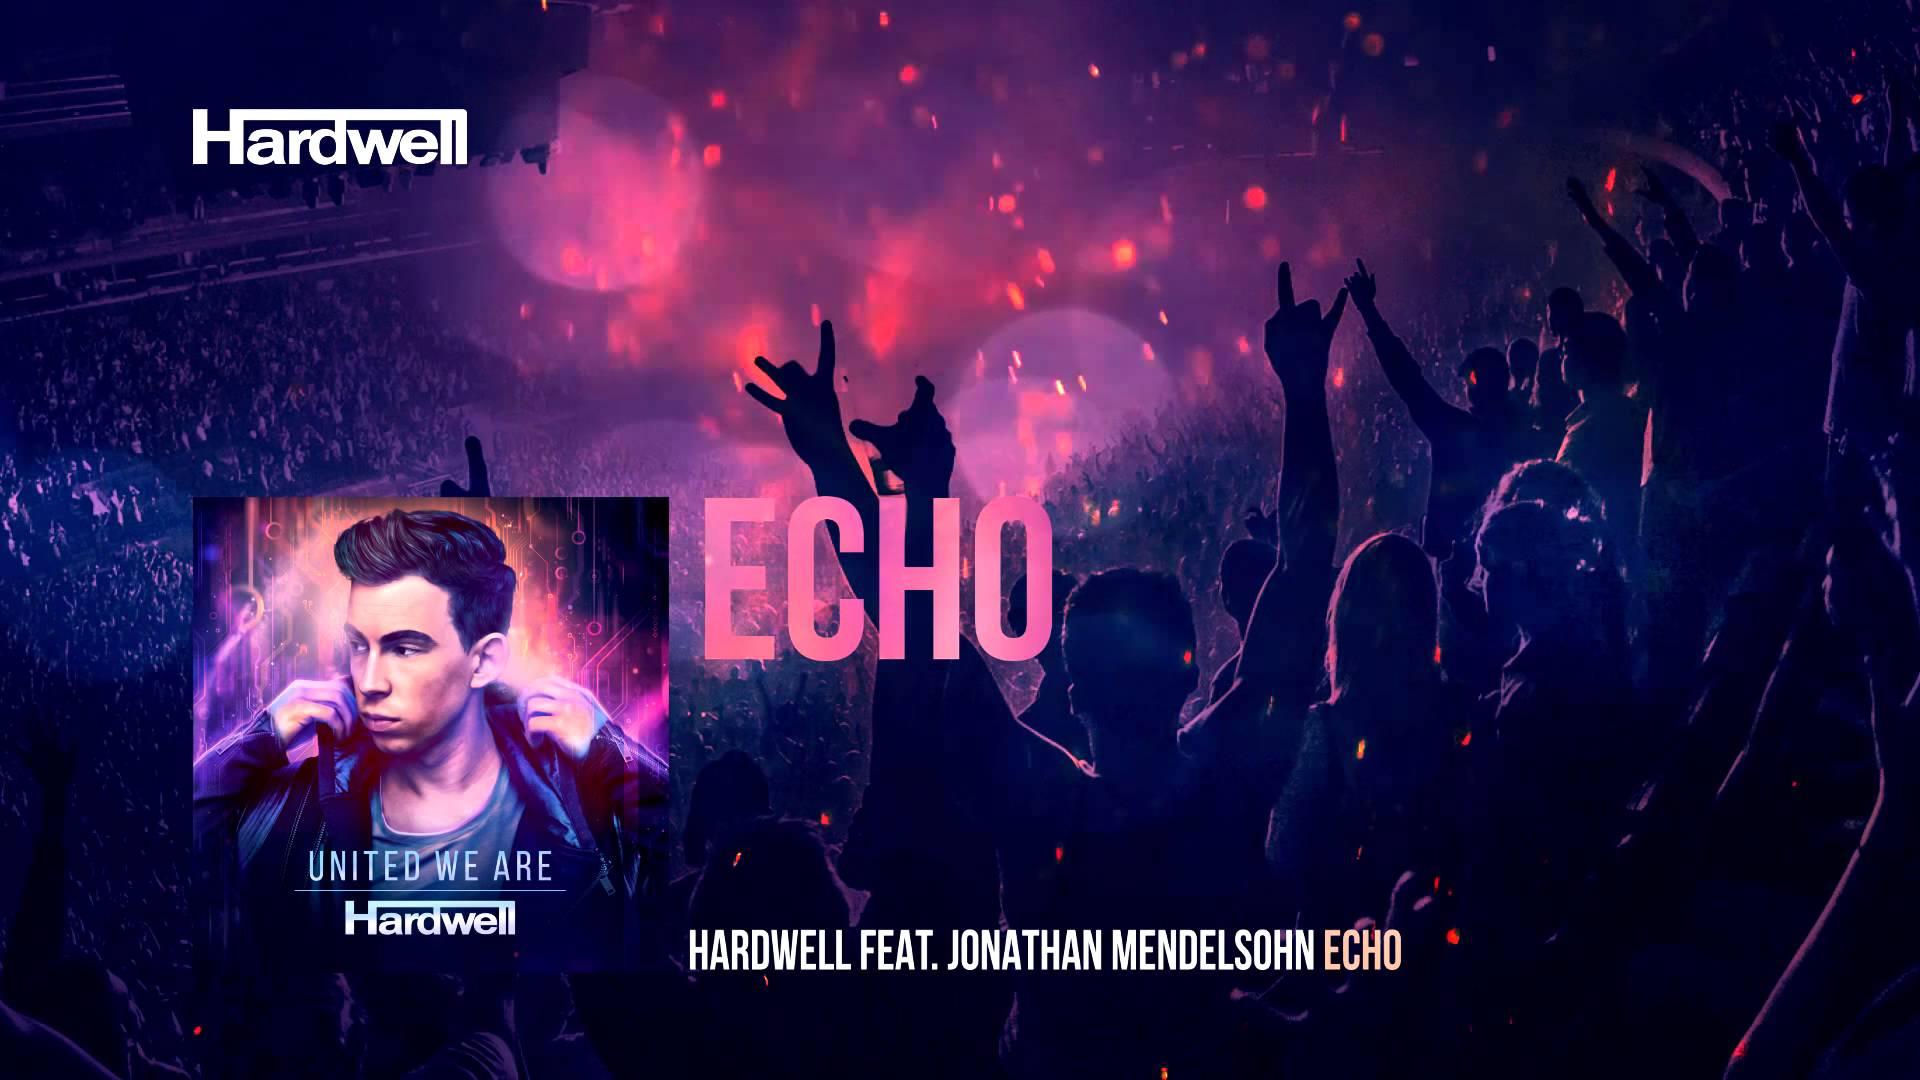 Hardwell feat. Jonathan Mendelsohn – Echo (Video)